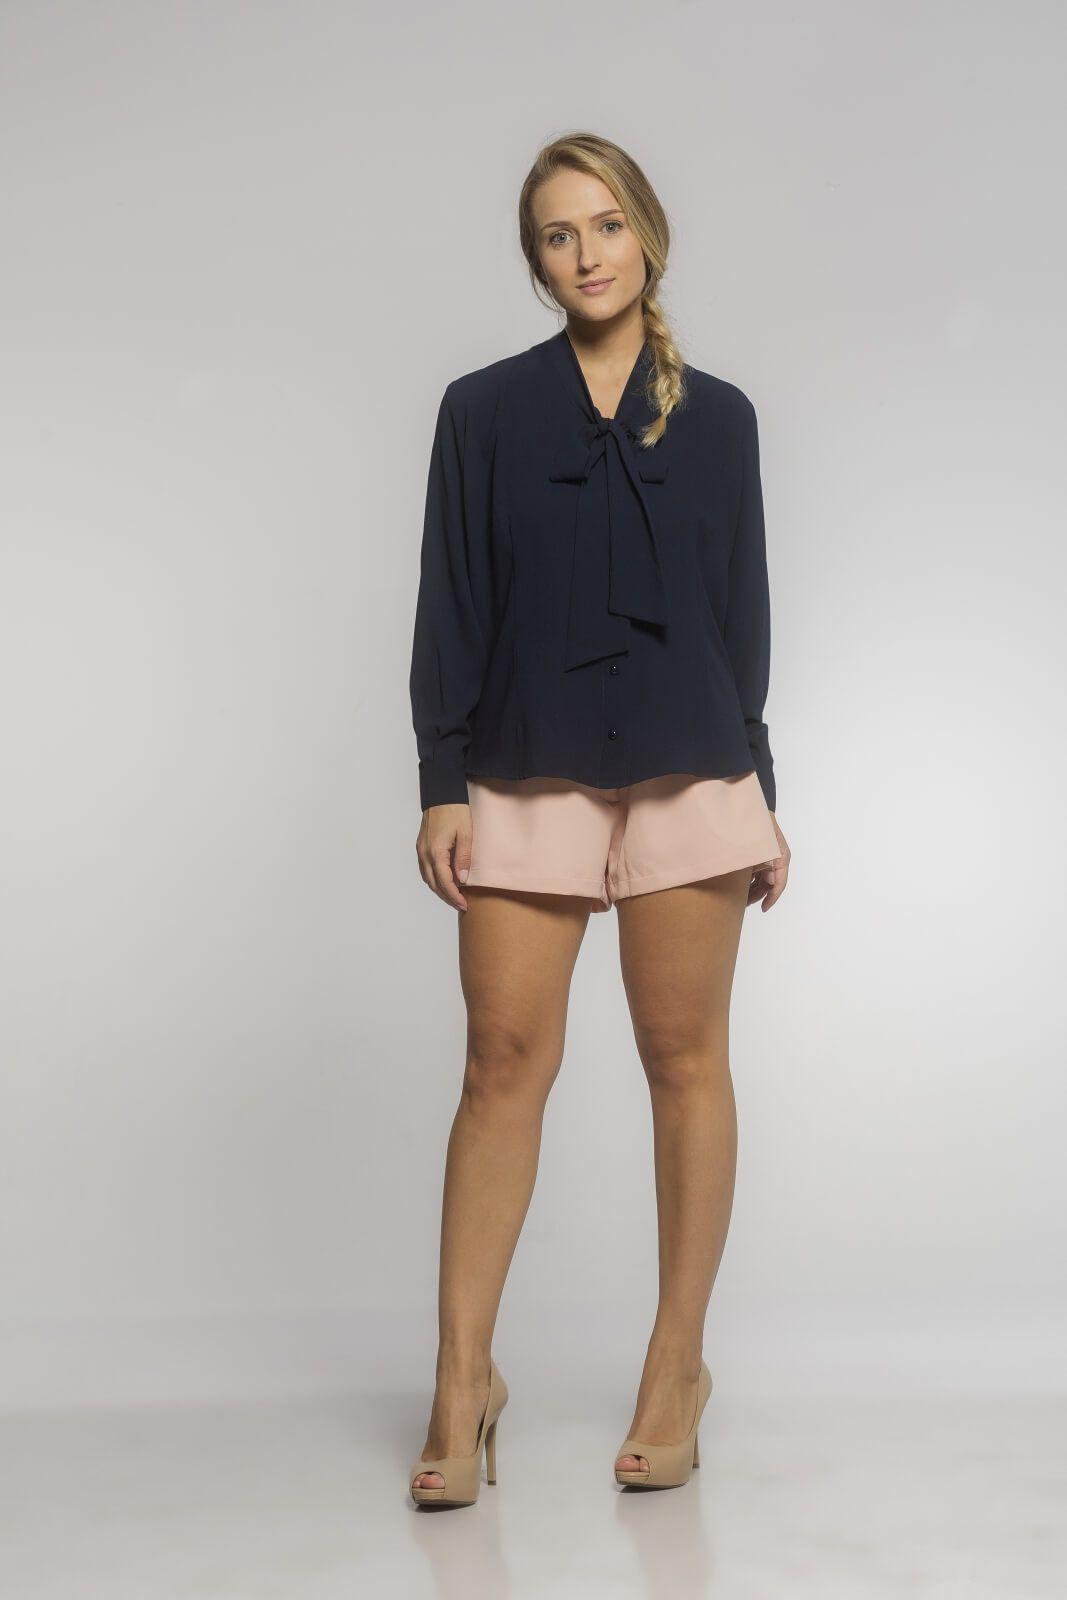 Camisa Feminina Gola Laço Crepe Azul Marinho